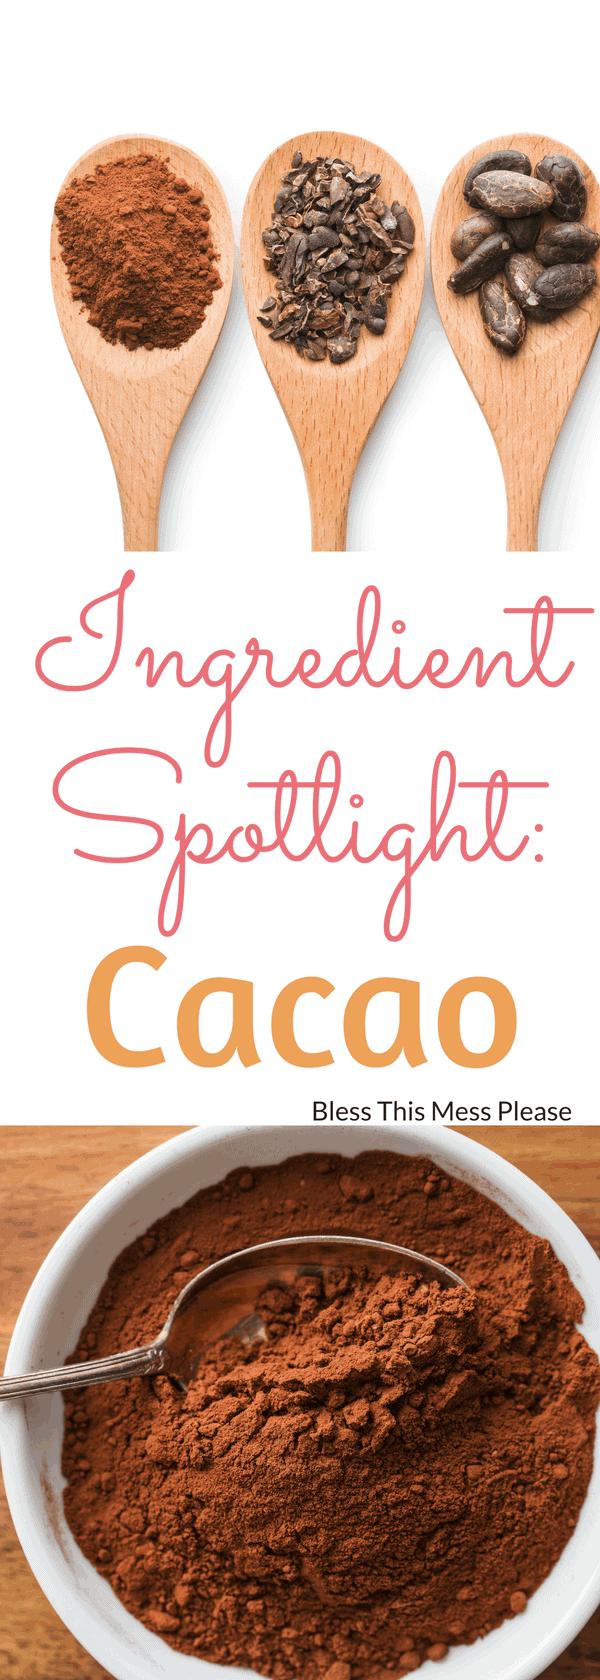 Ingredient Spotlight- Cacao